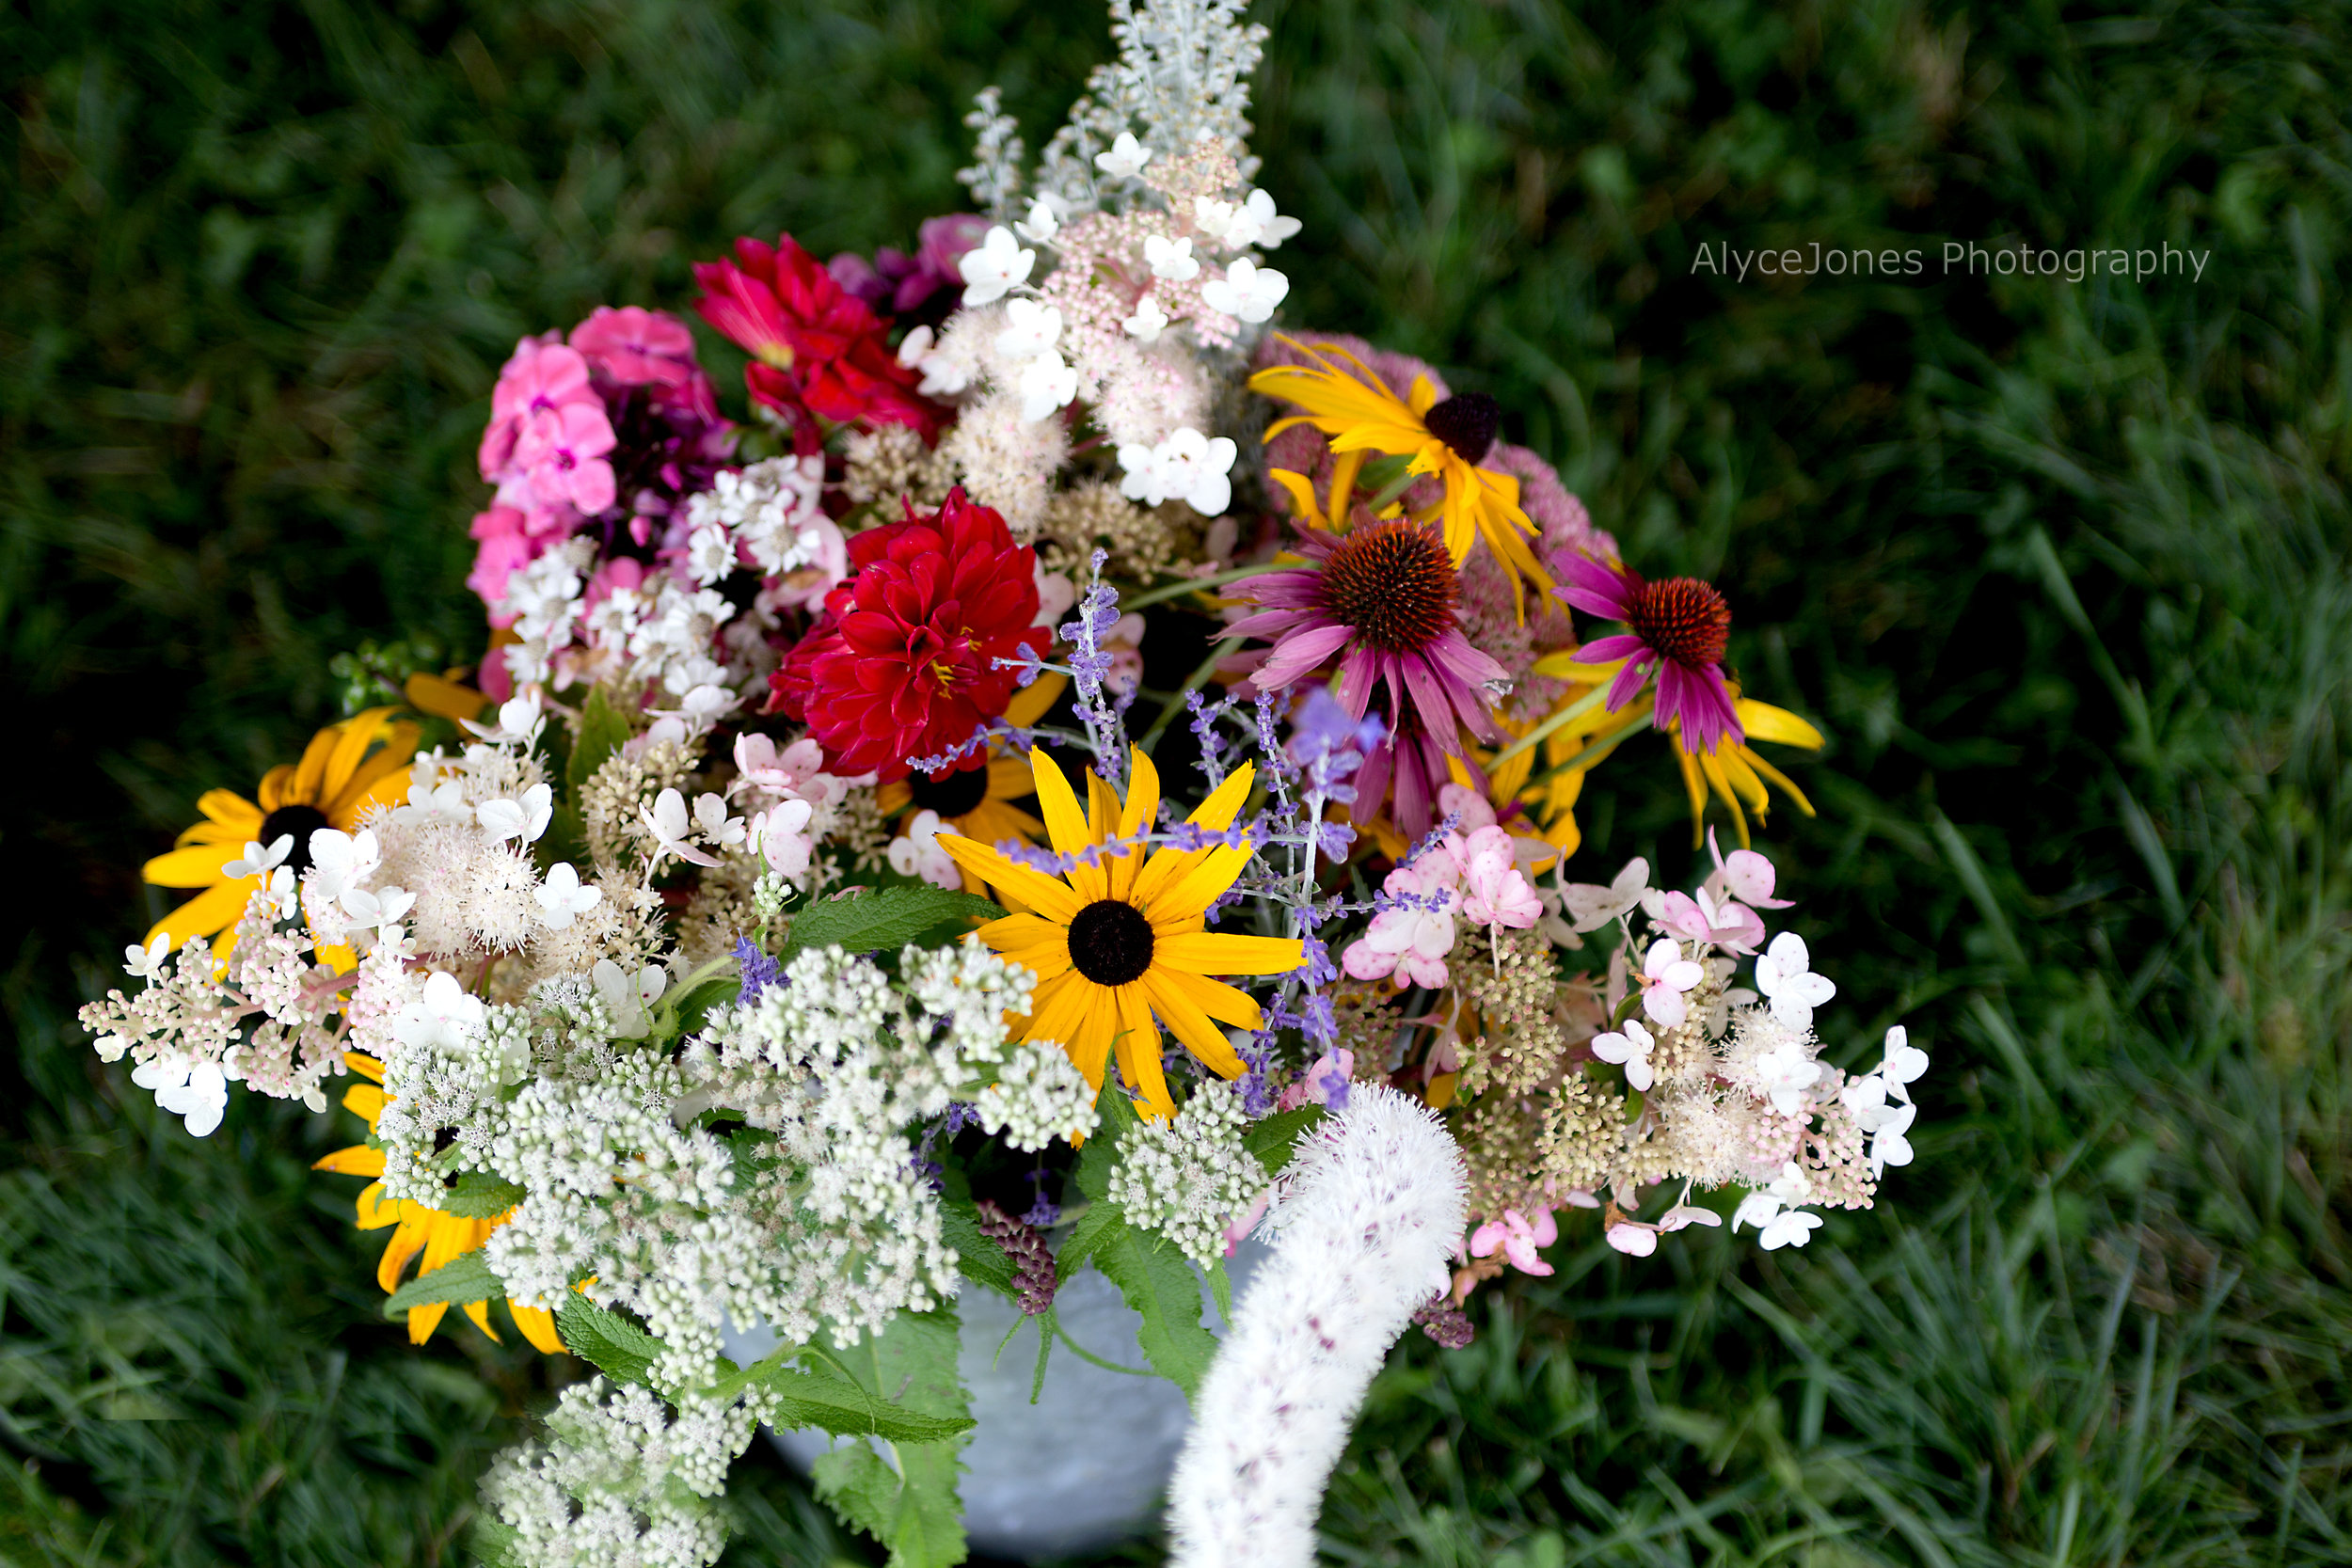 1709_stowejazzfest2017_sunday_flowers_001.jpg